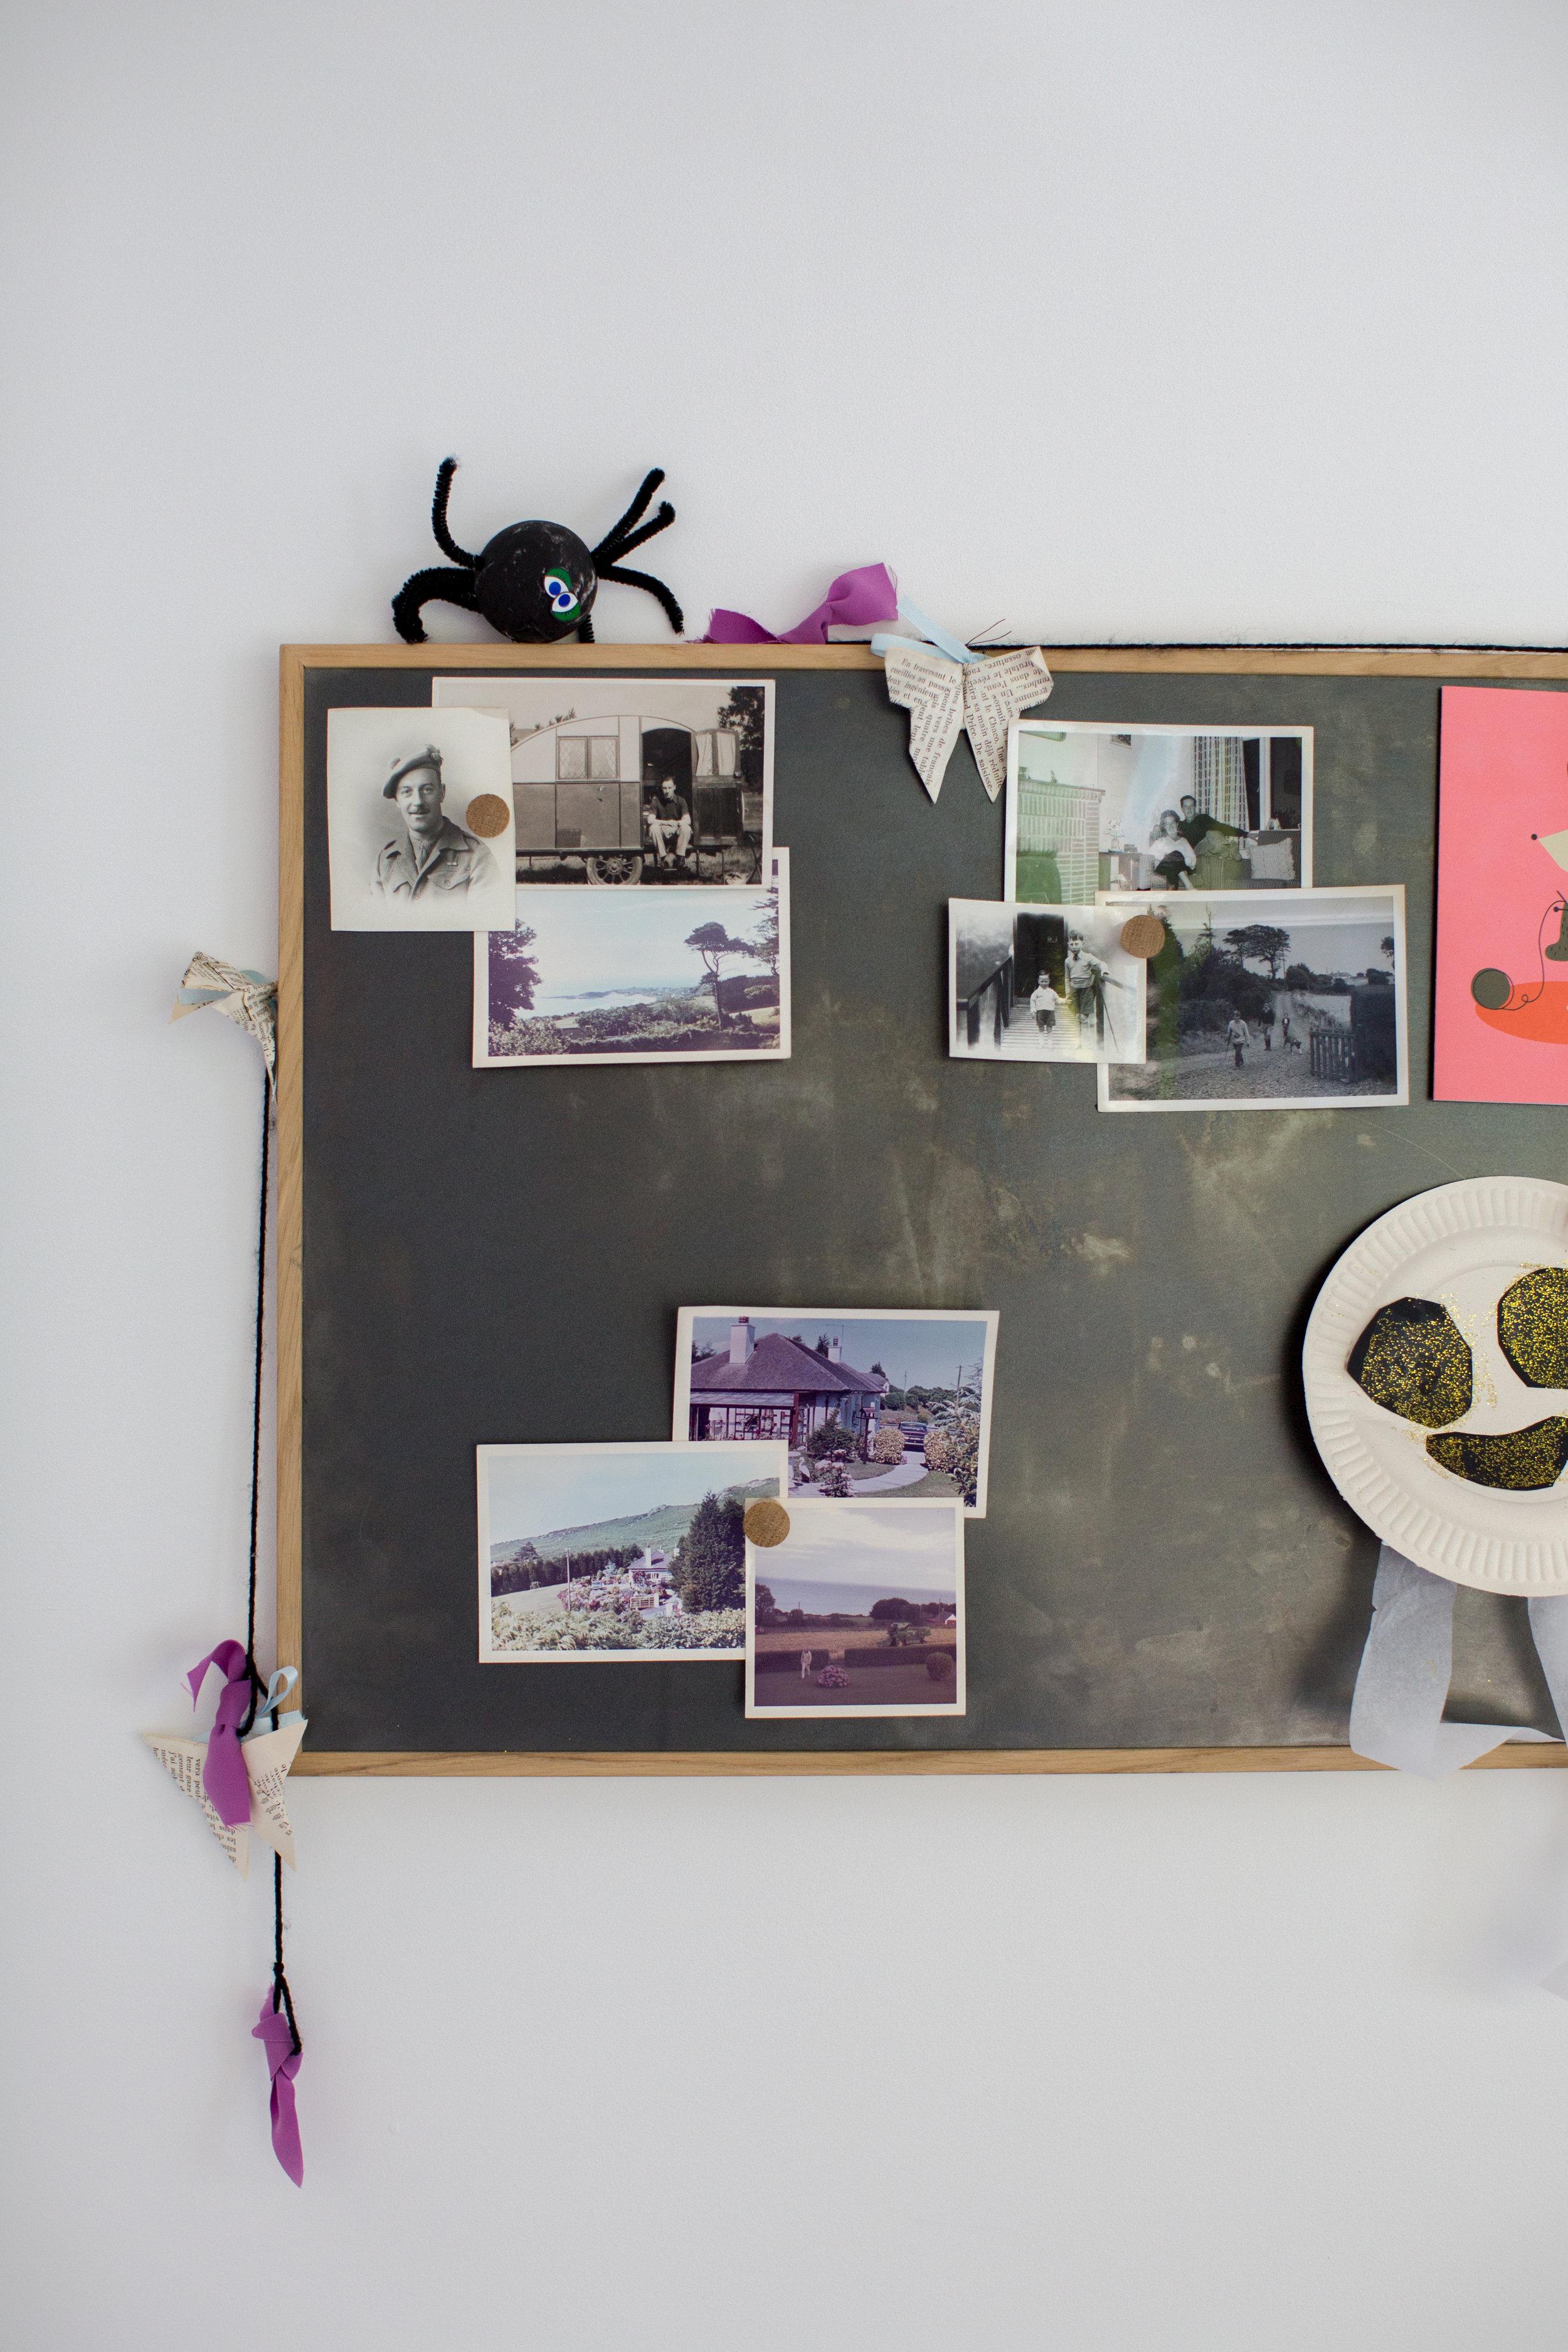 Lamb_Design_Paper_and_Moon_Emma_Lynch_Louise_Dockery_Scandi_French_Danish_homeware_Irish_business_interior_designer_vintage_chalkboard.jpg